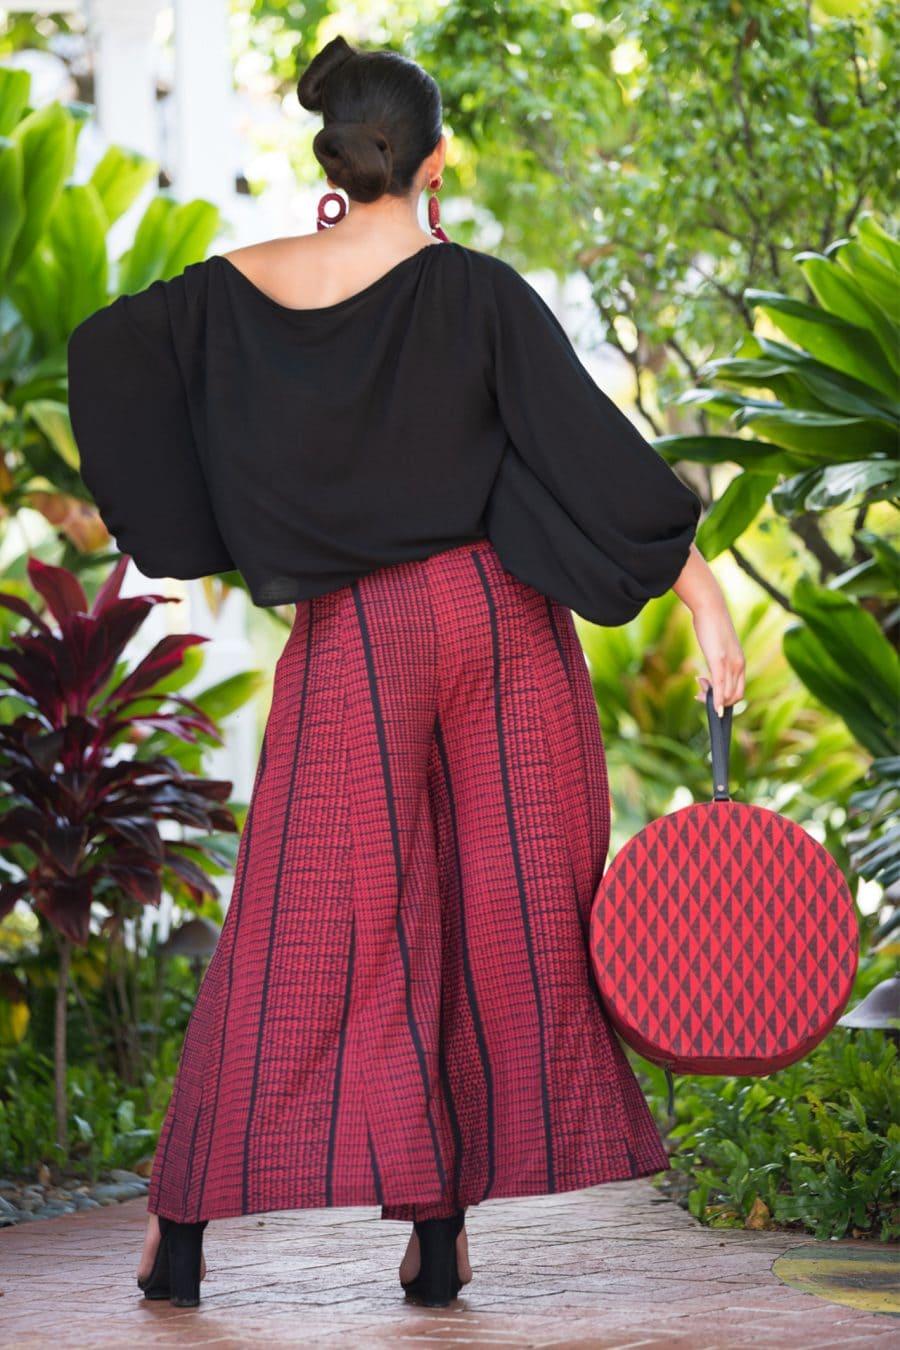 Model wearing Huakai Pant in Deepwell Brick Red Nihoku Pattern - Back View